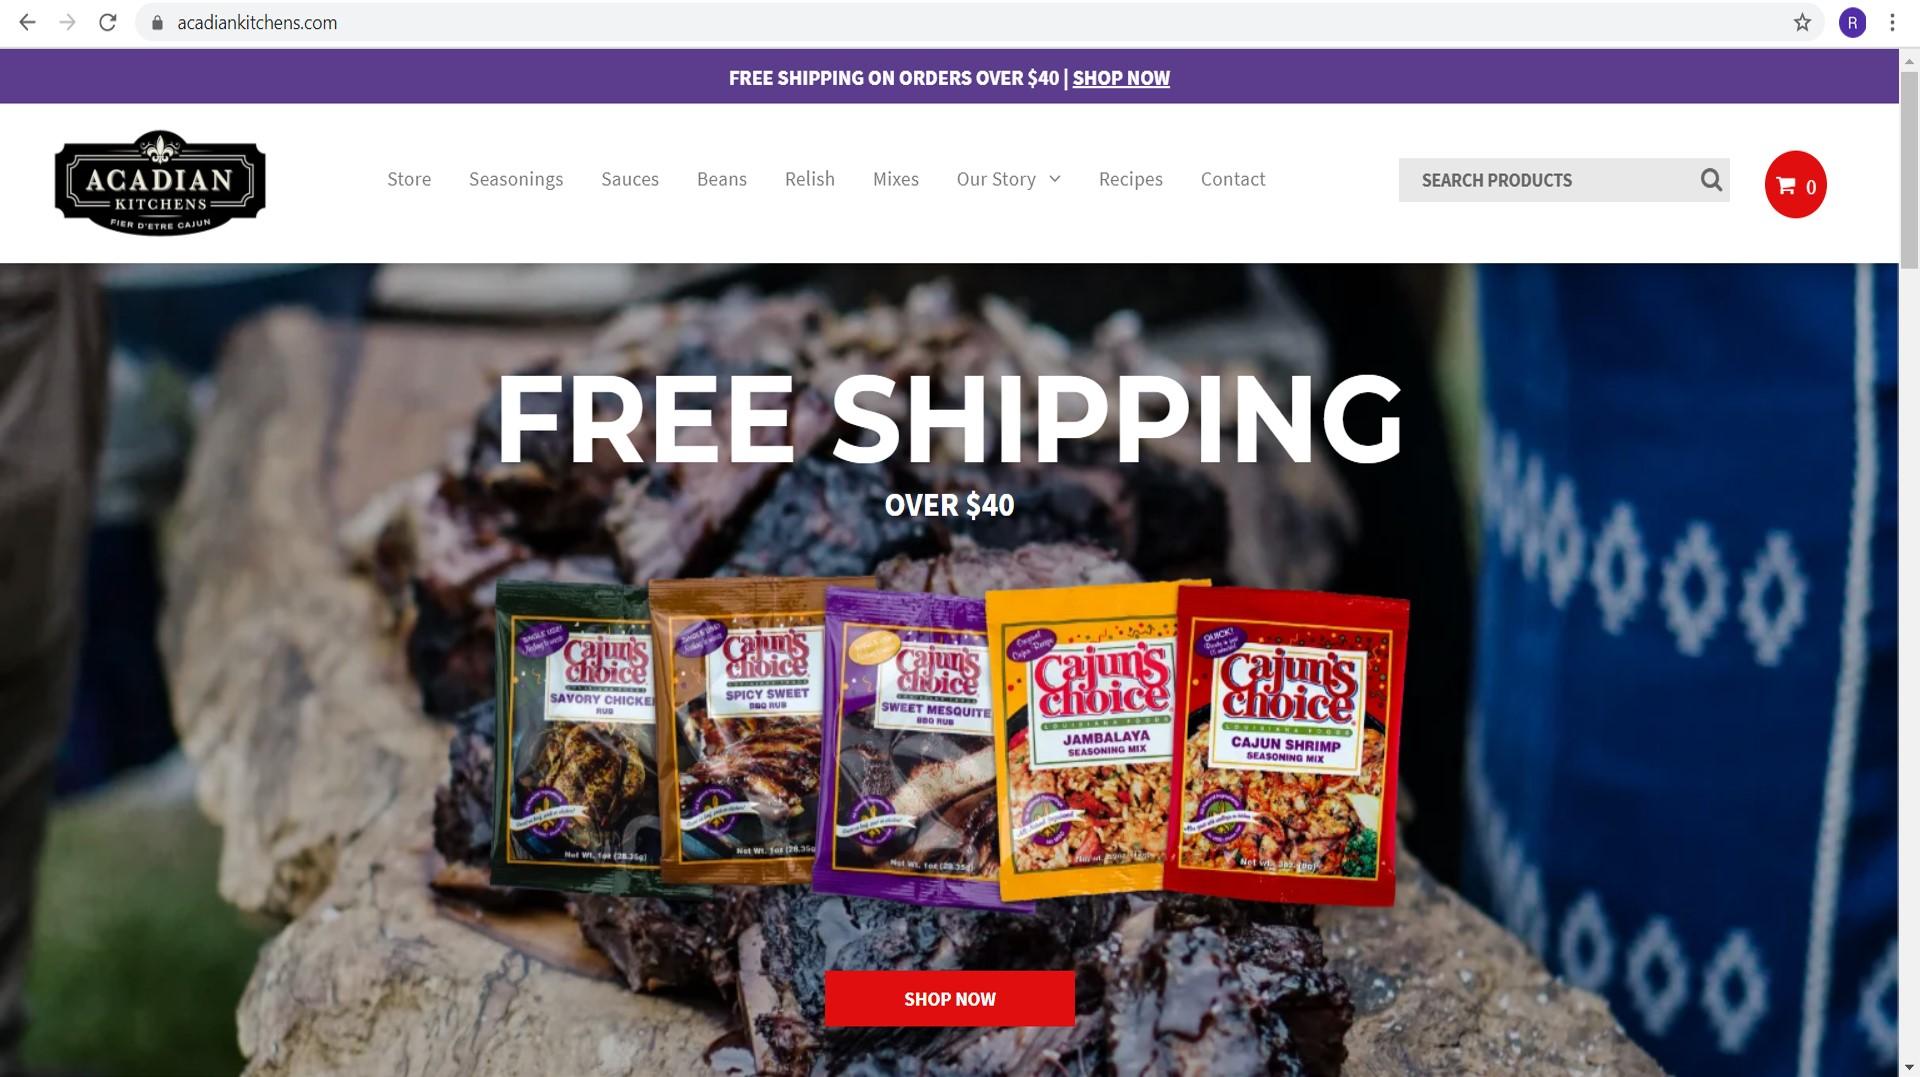 New Acadian Kitchens Website